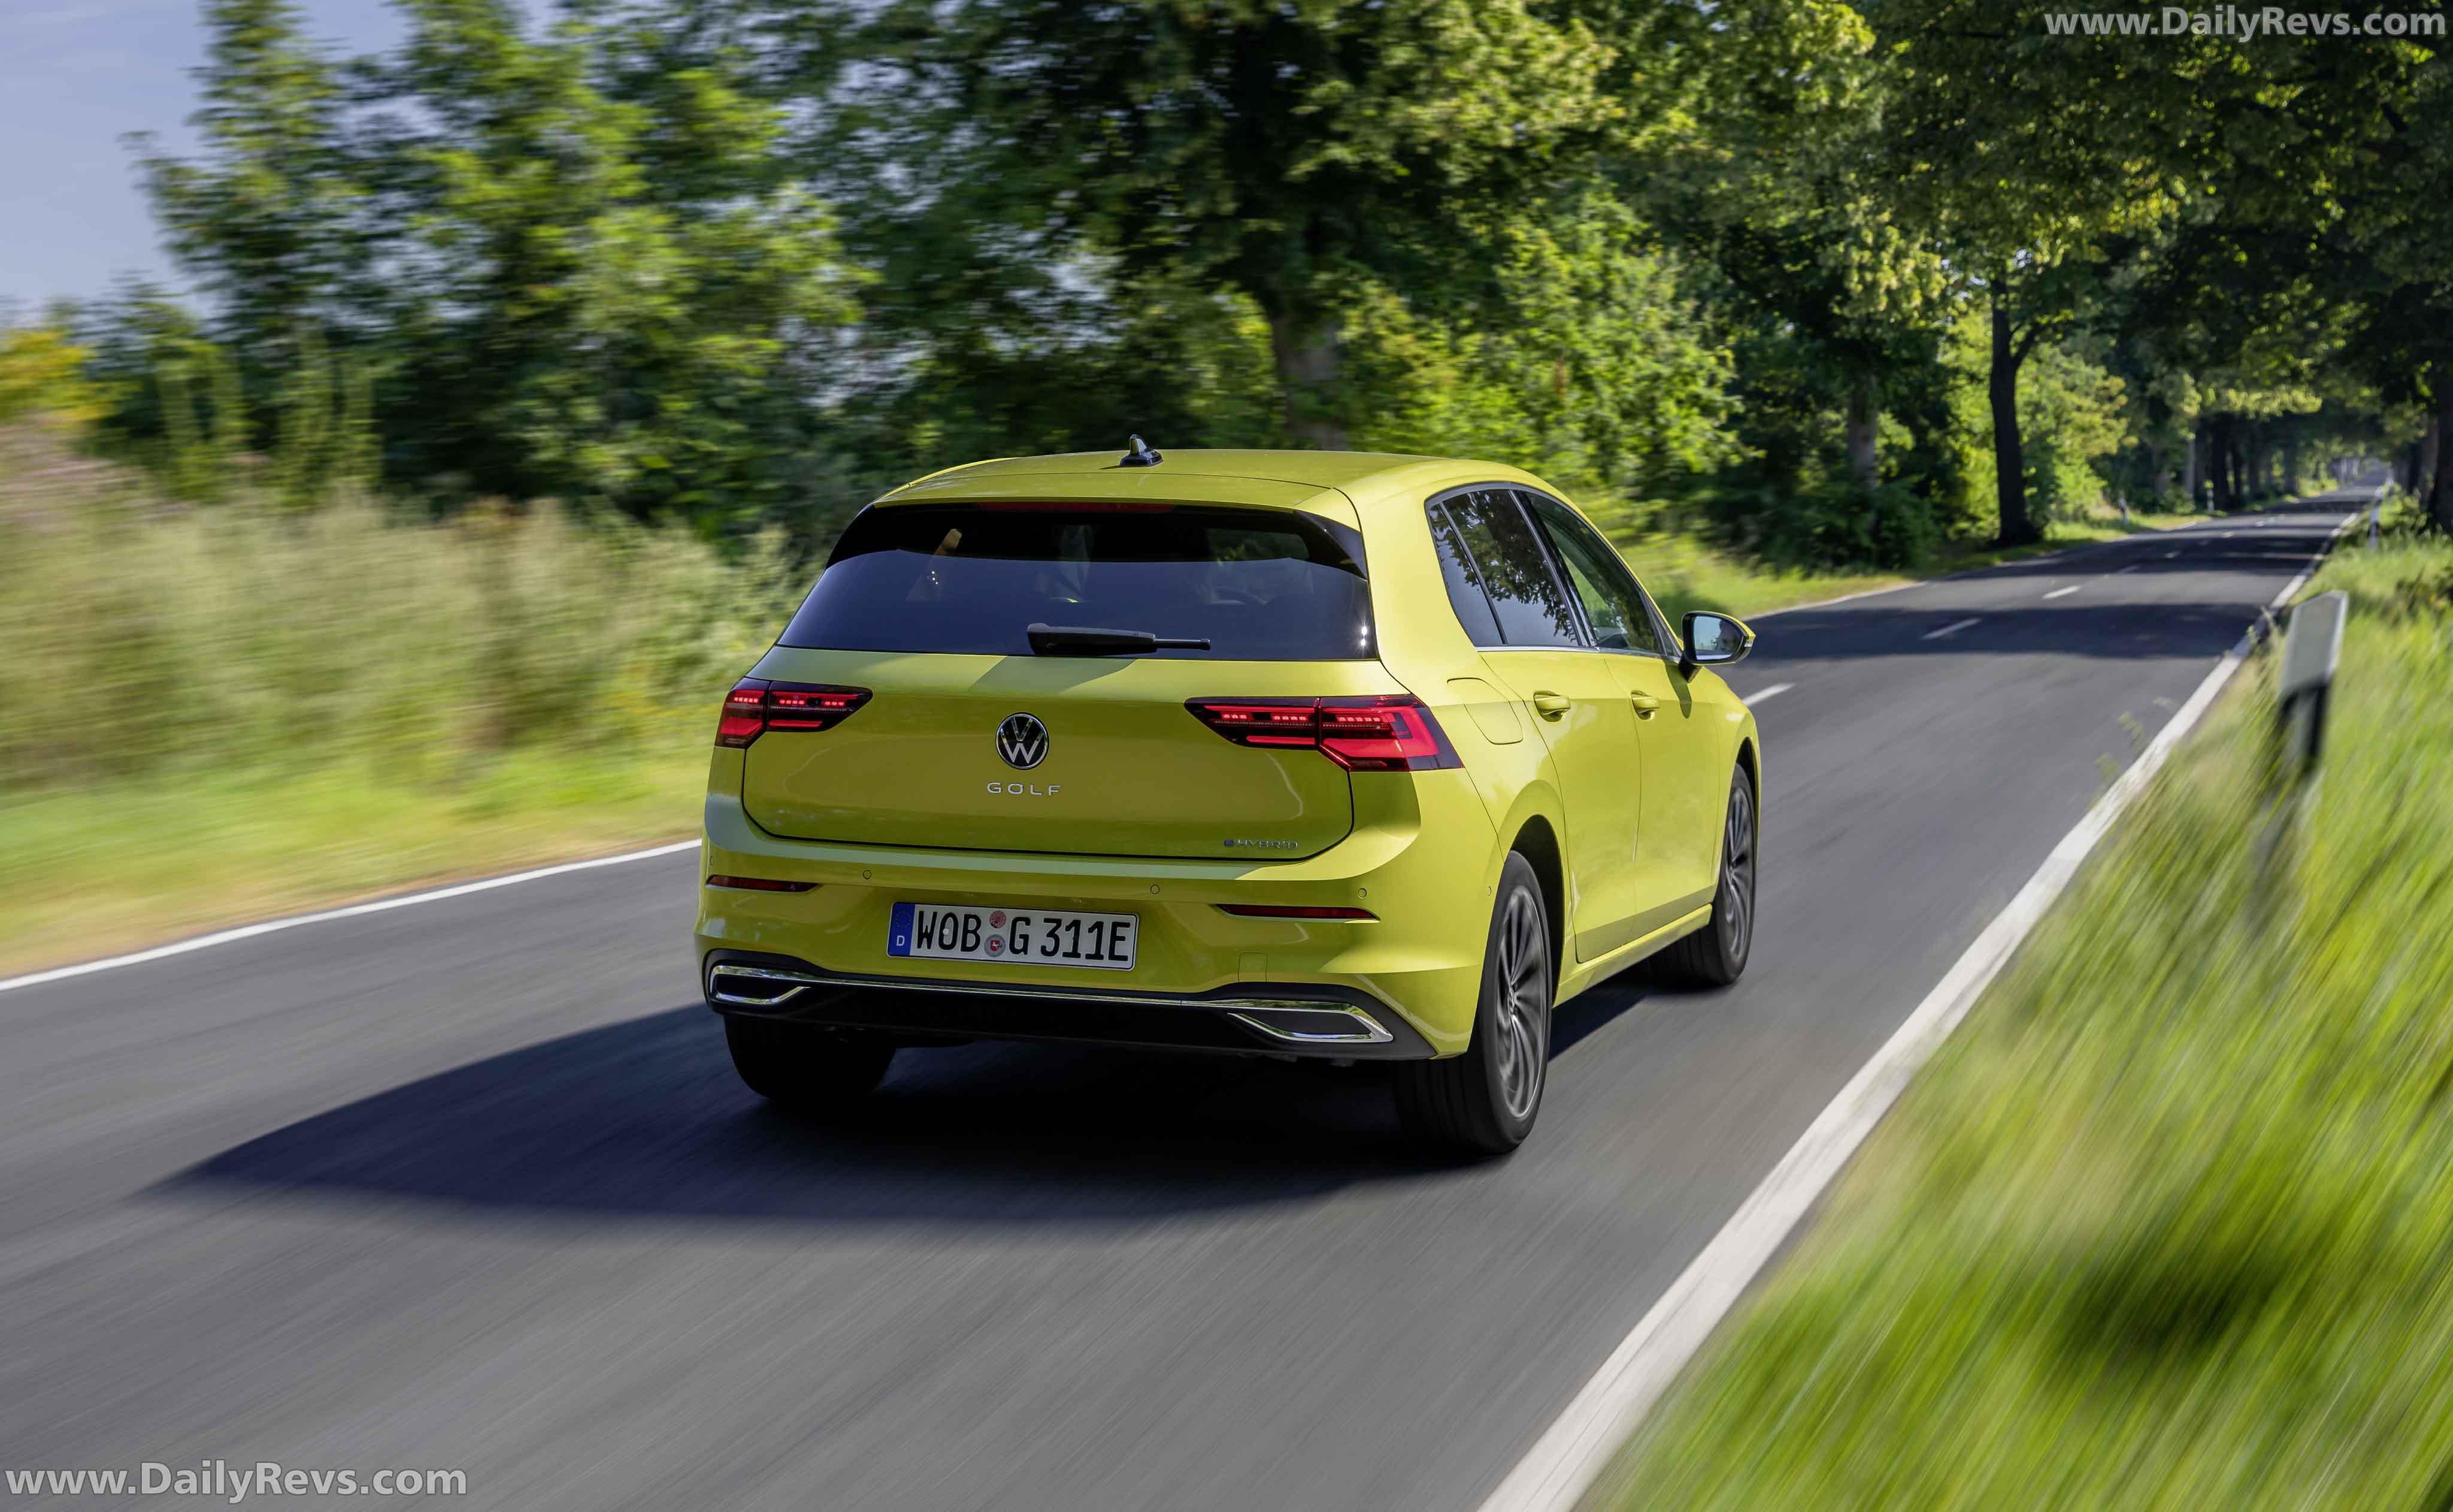 2021 Volkswagen Golf e-Hybrid - Dailyrevs